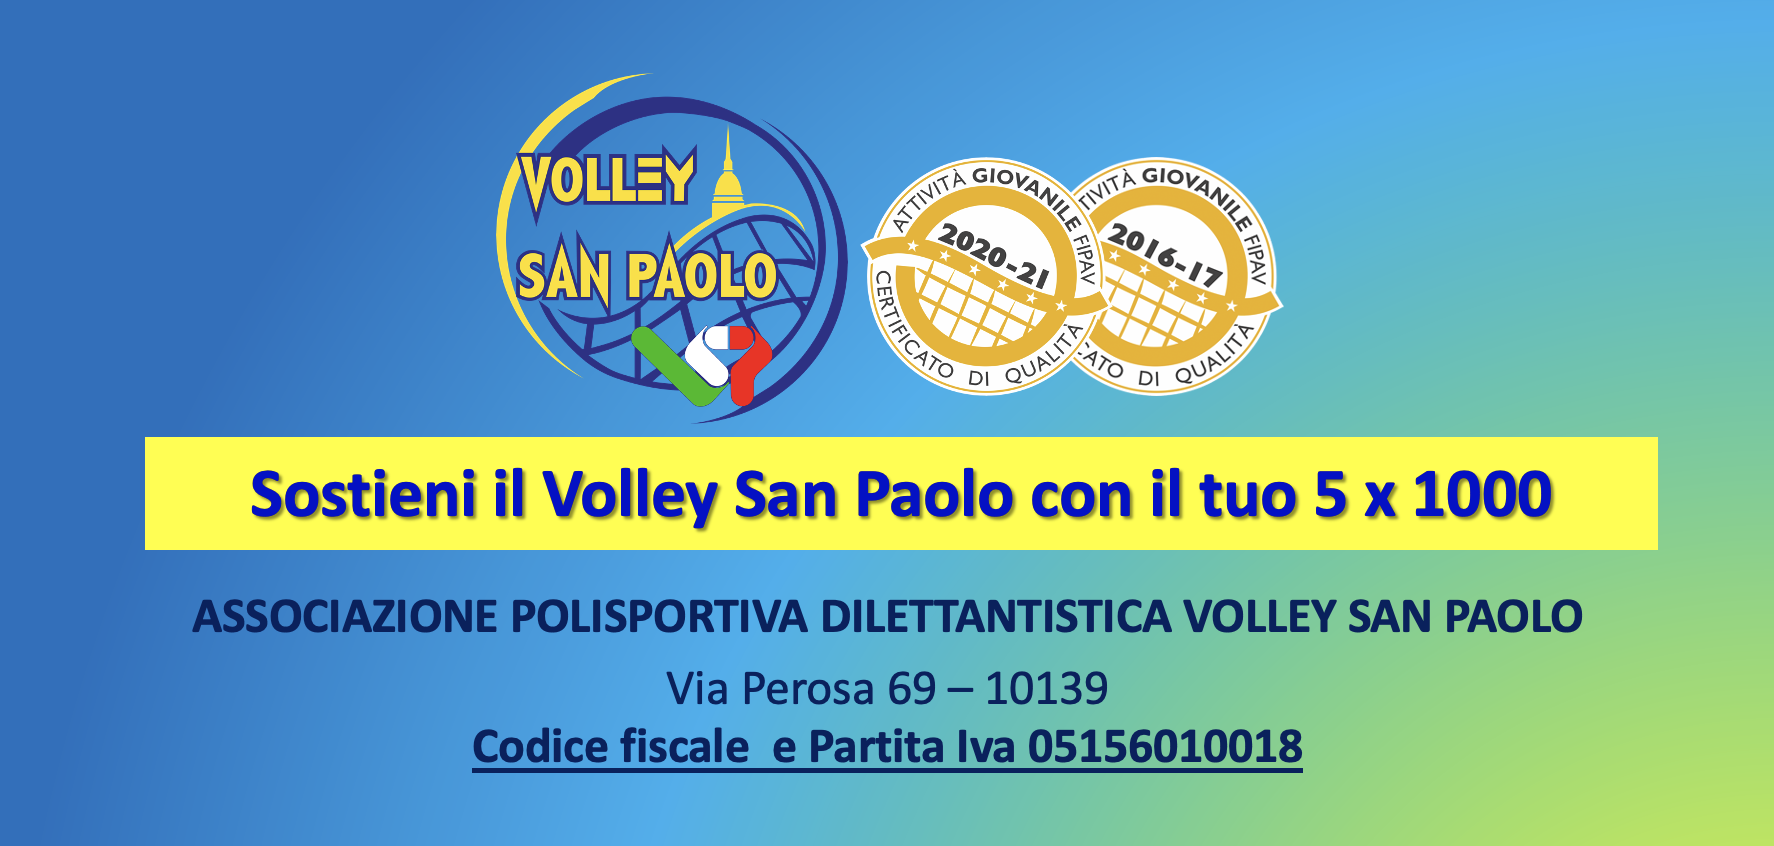 Sostieni il Volley San Paolo